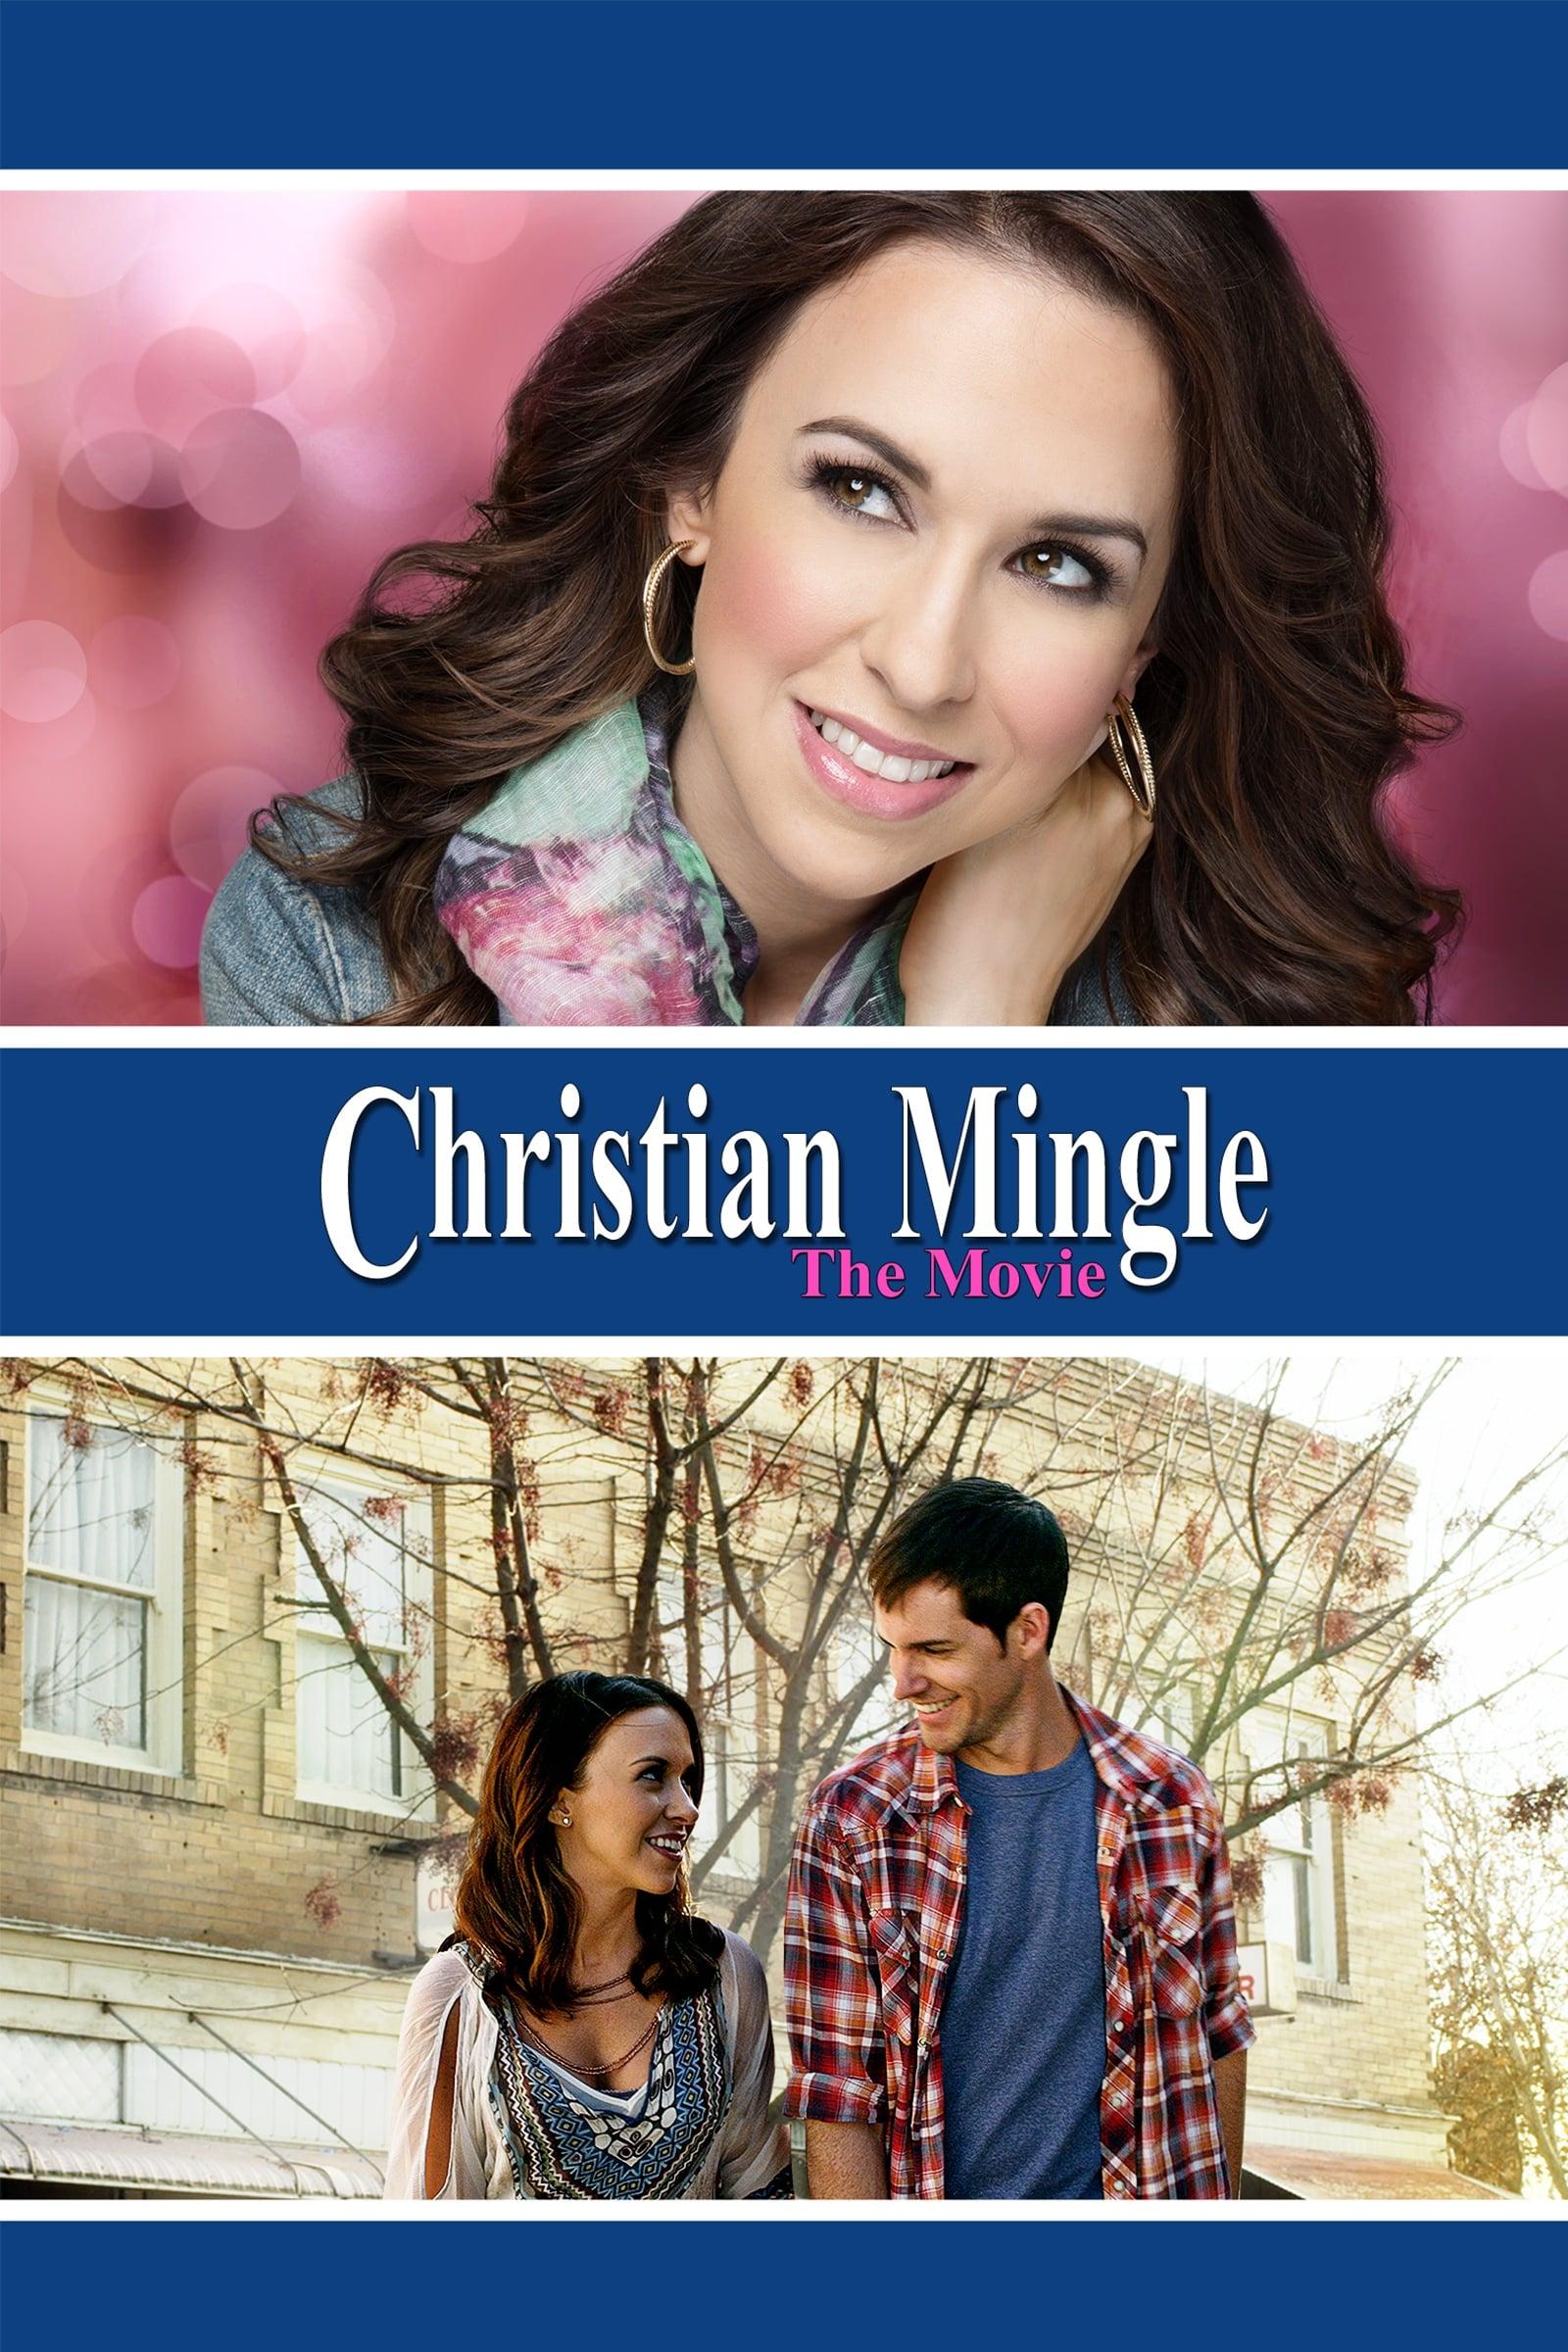 Christian Mingle